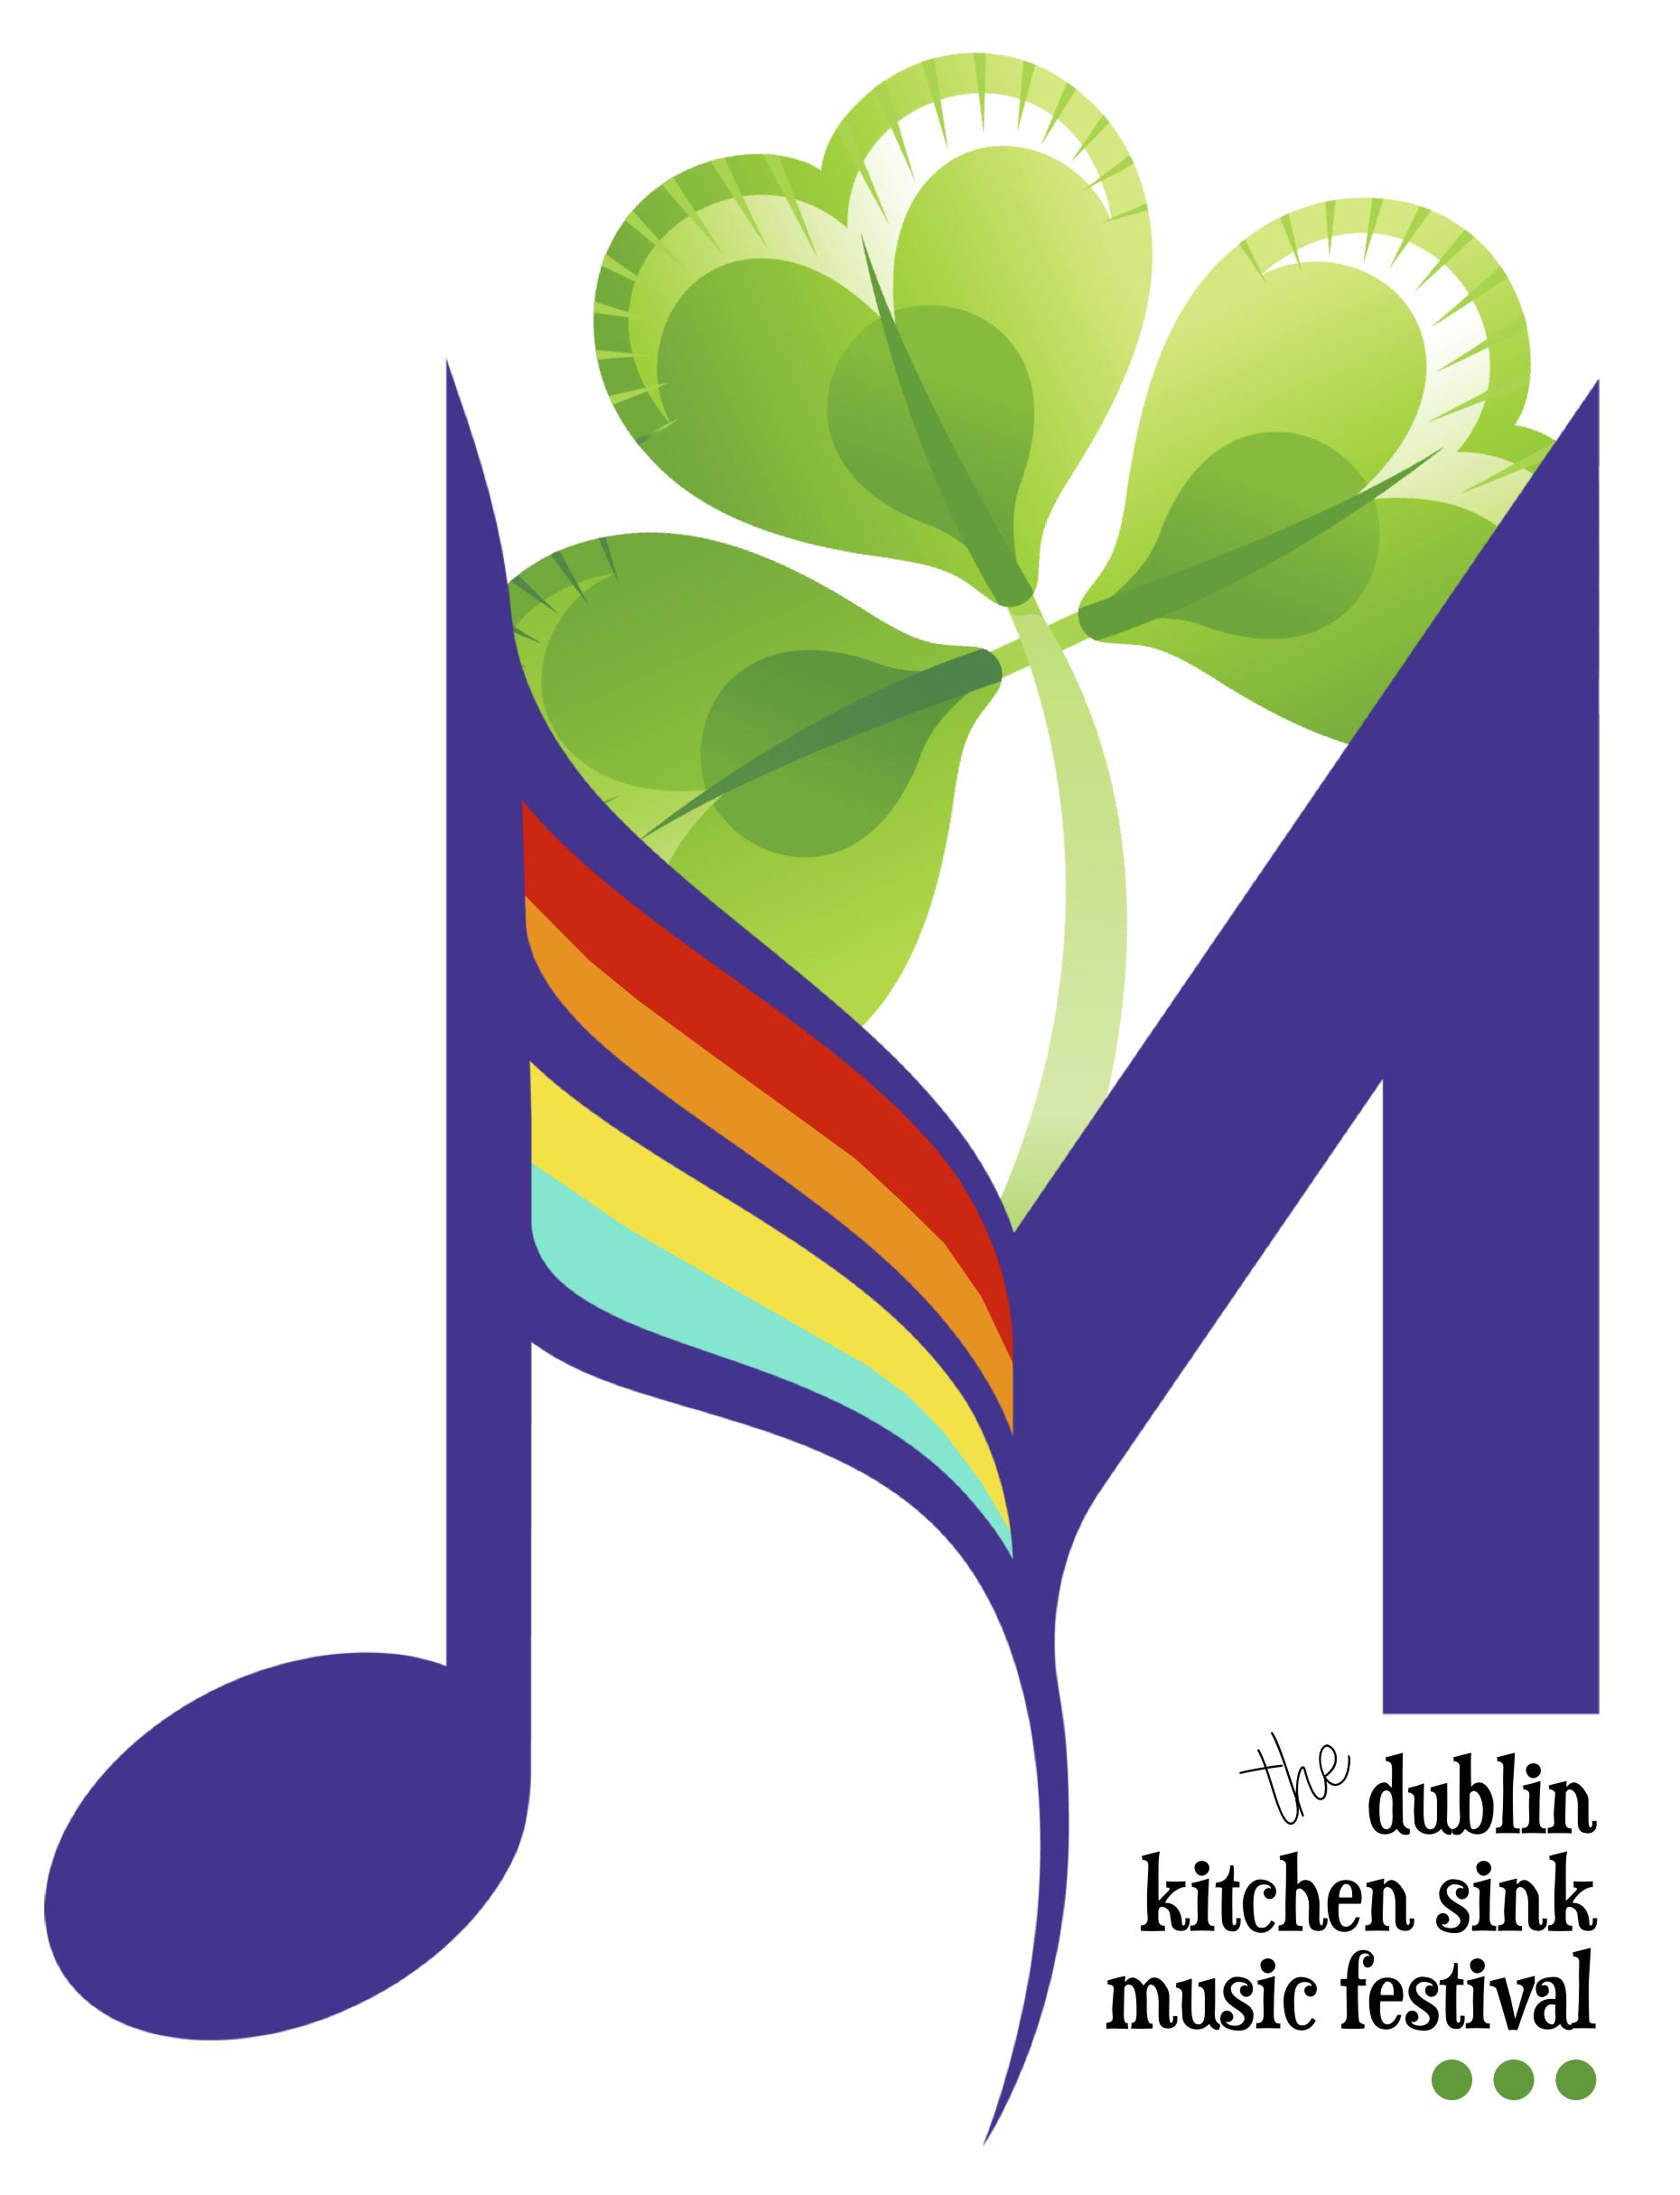 KitchenSinkMusicFestival.png